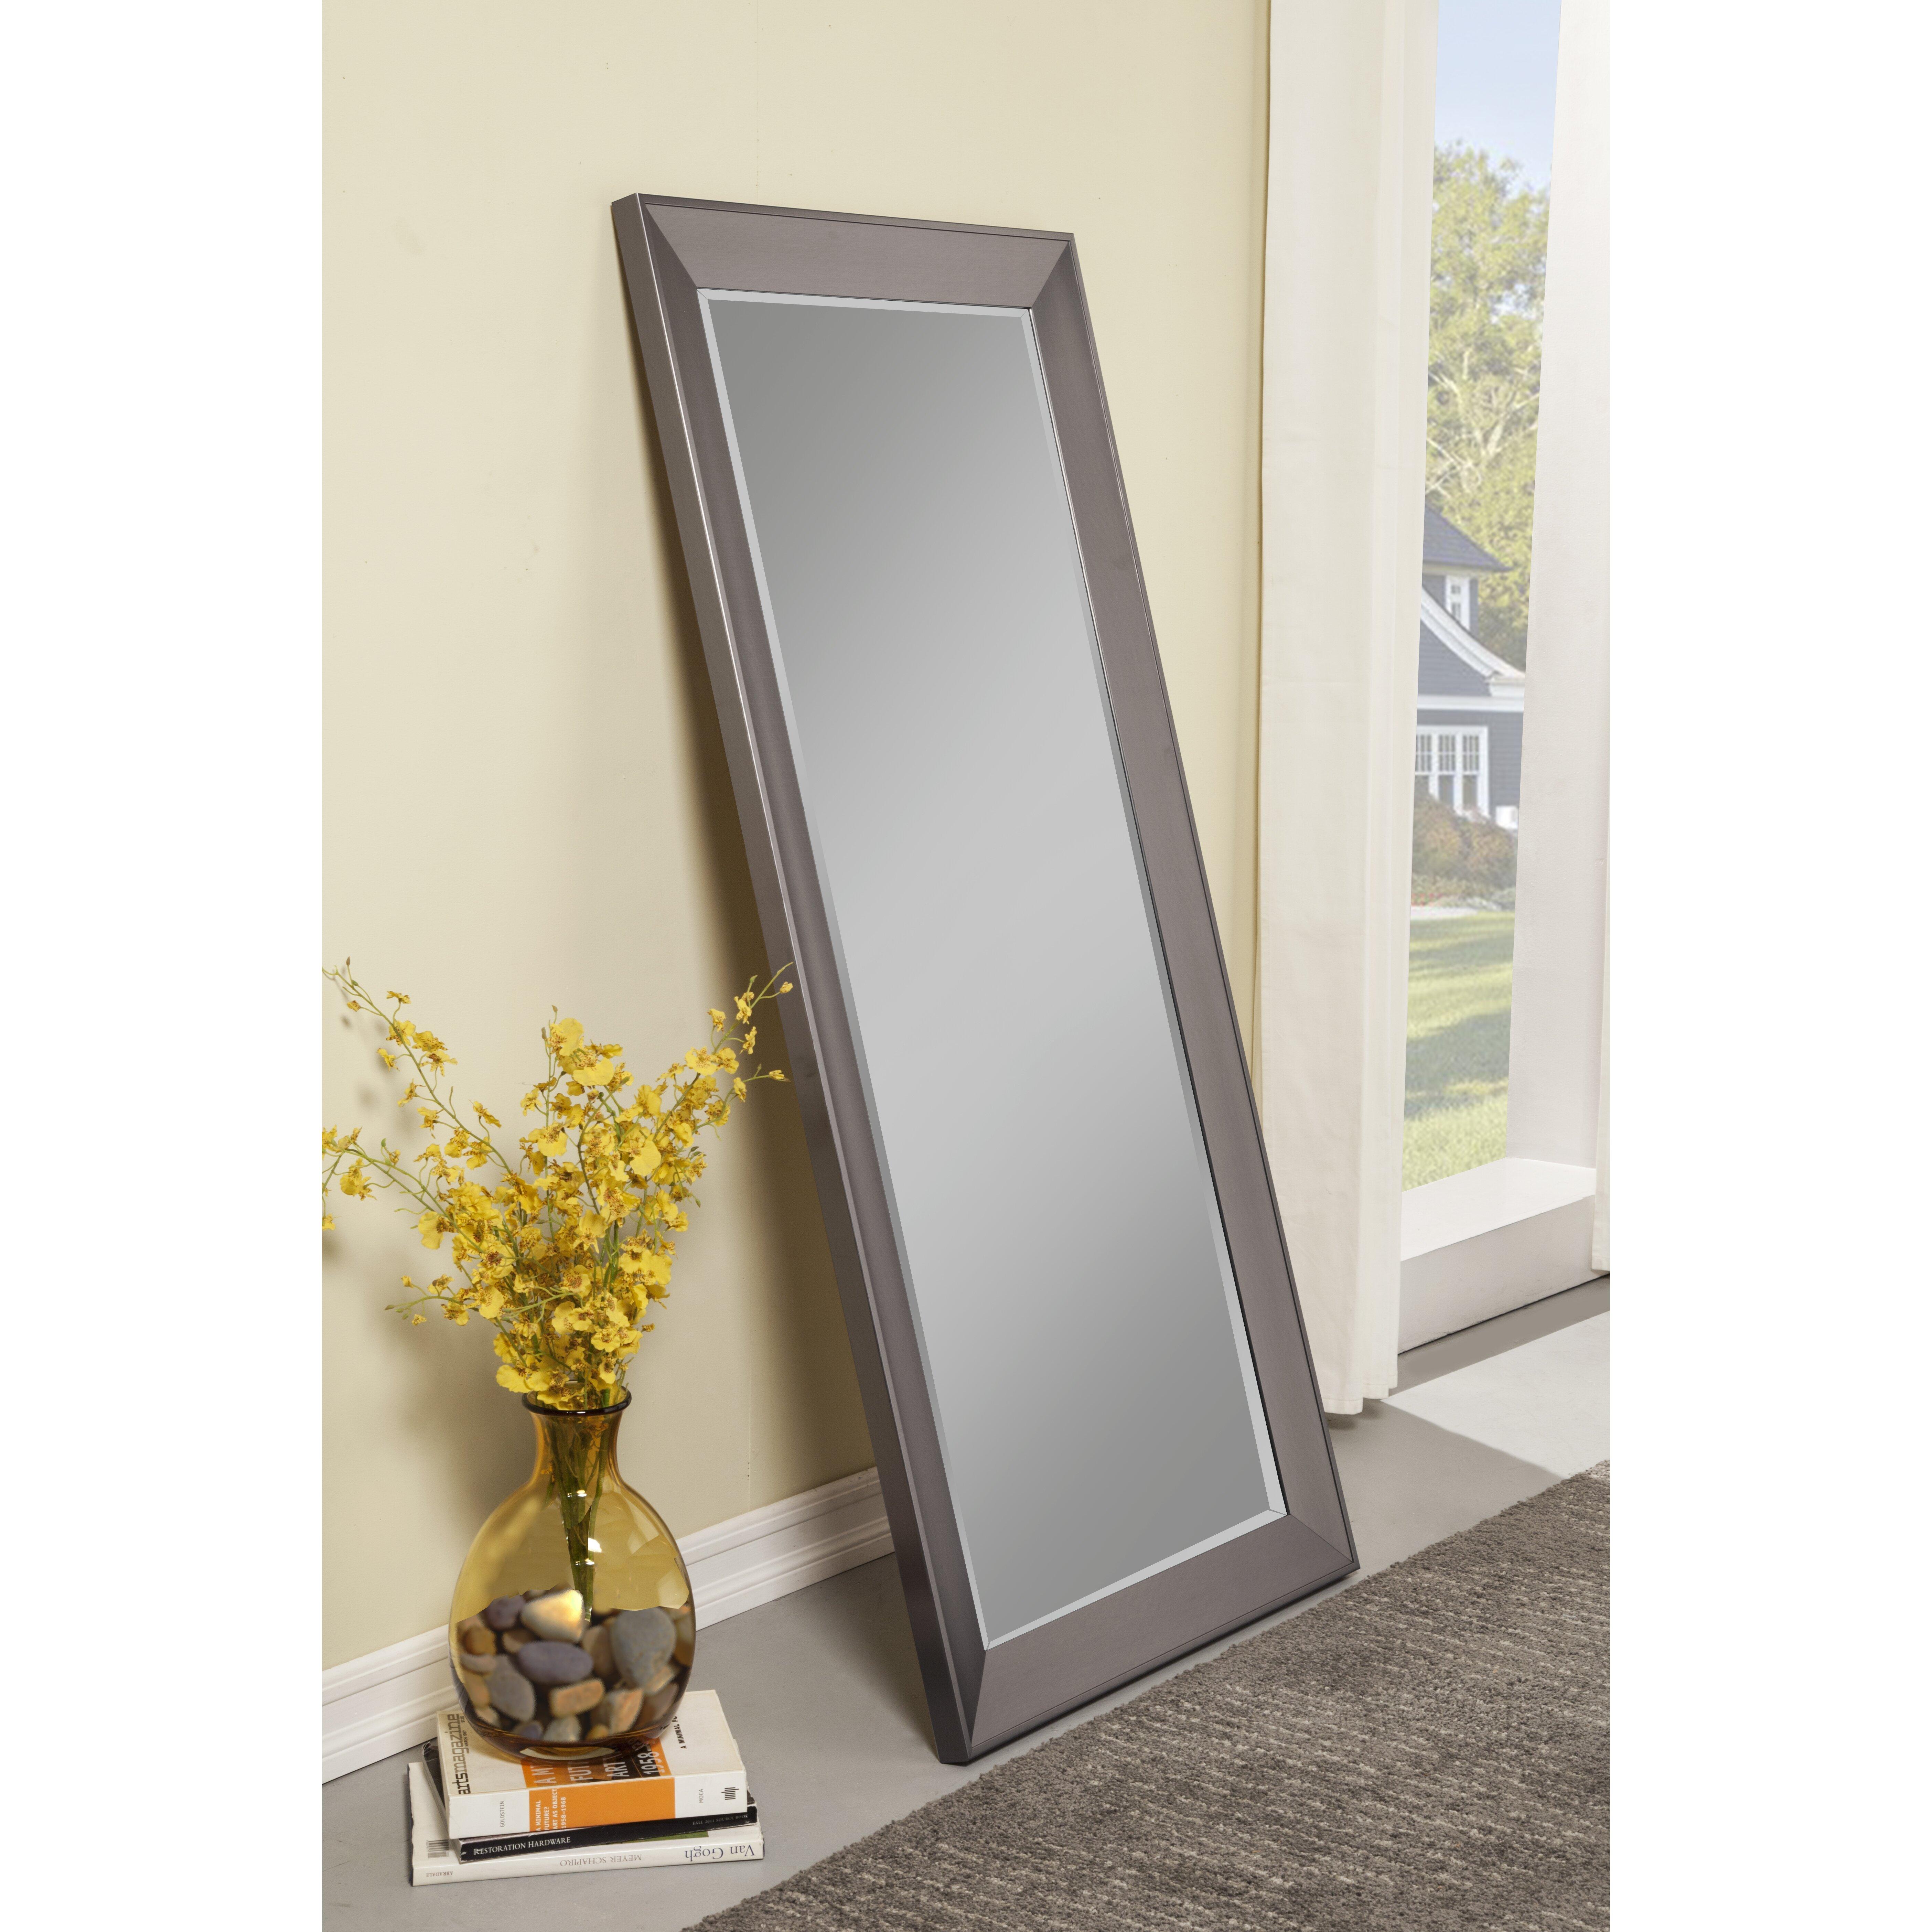 Cheap floor standing mirrors